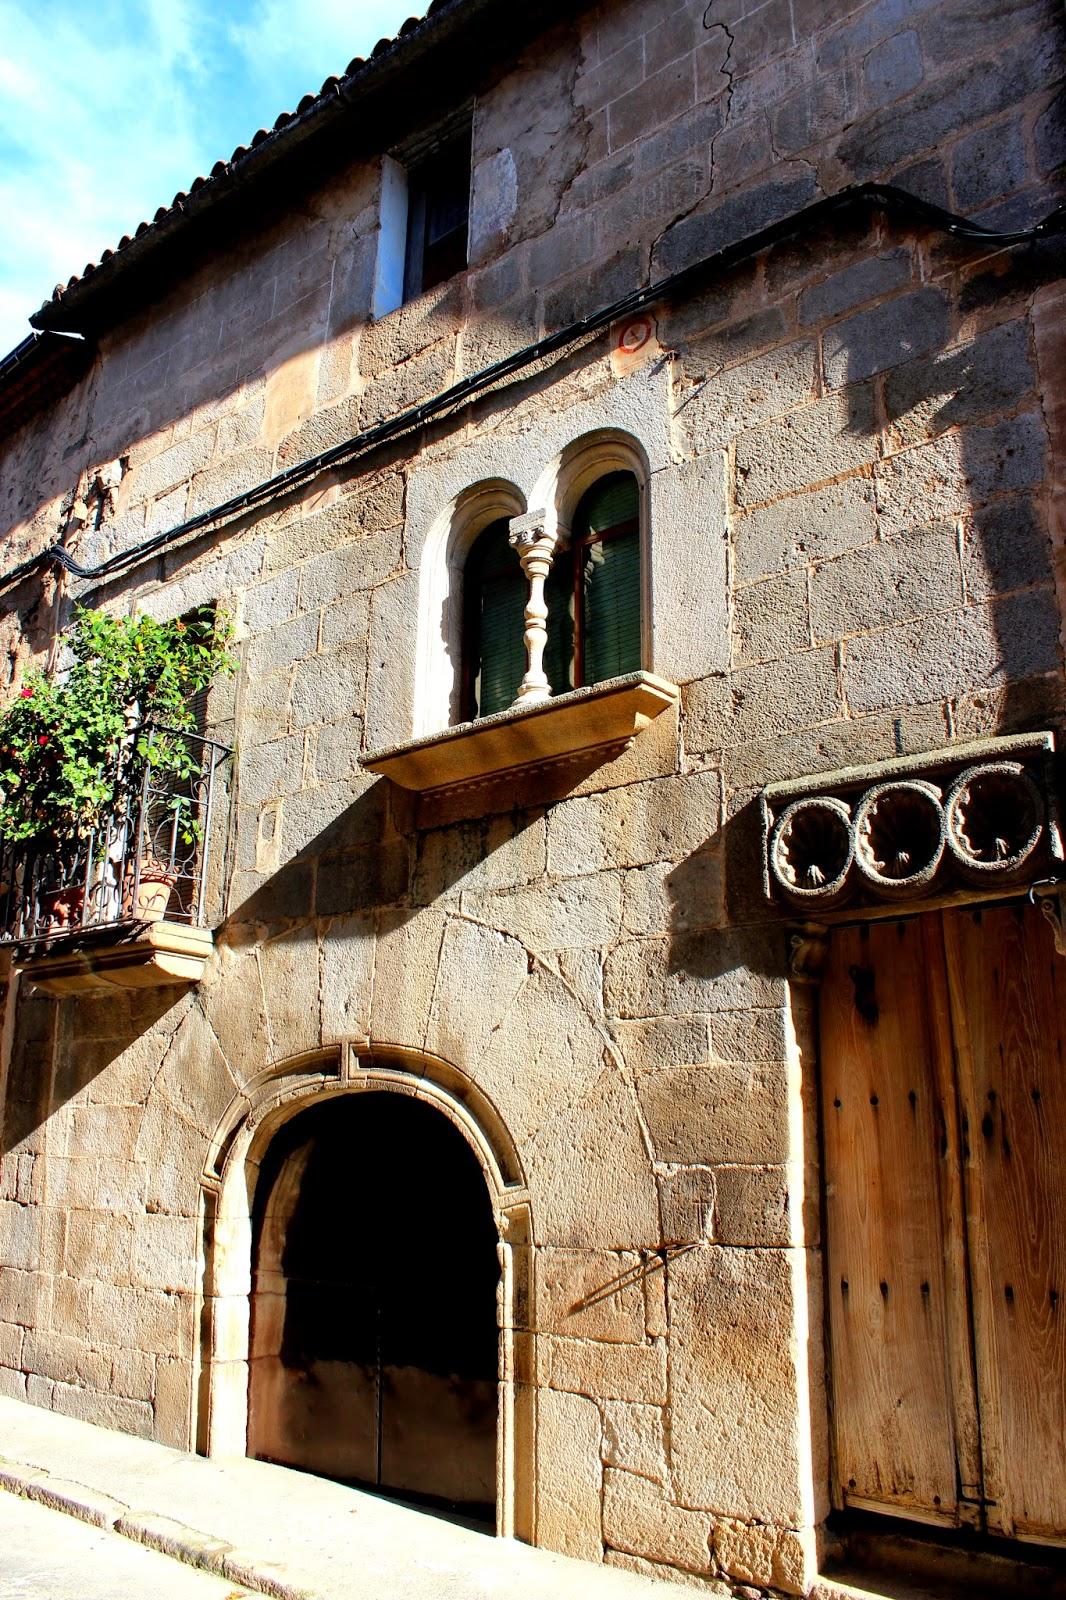 Patrimonio artístico de Hoyos. Sierra de Gata. Cáceres